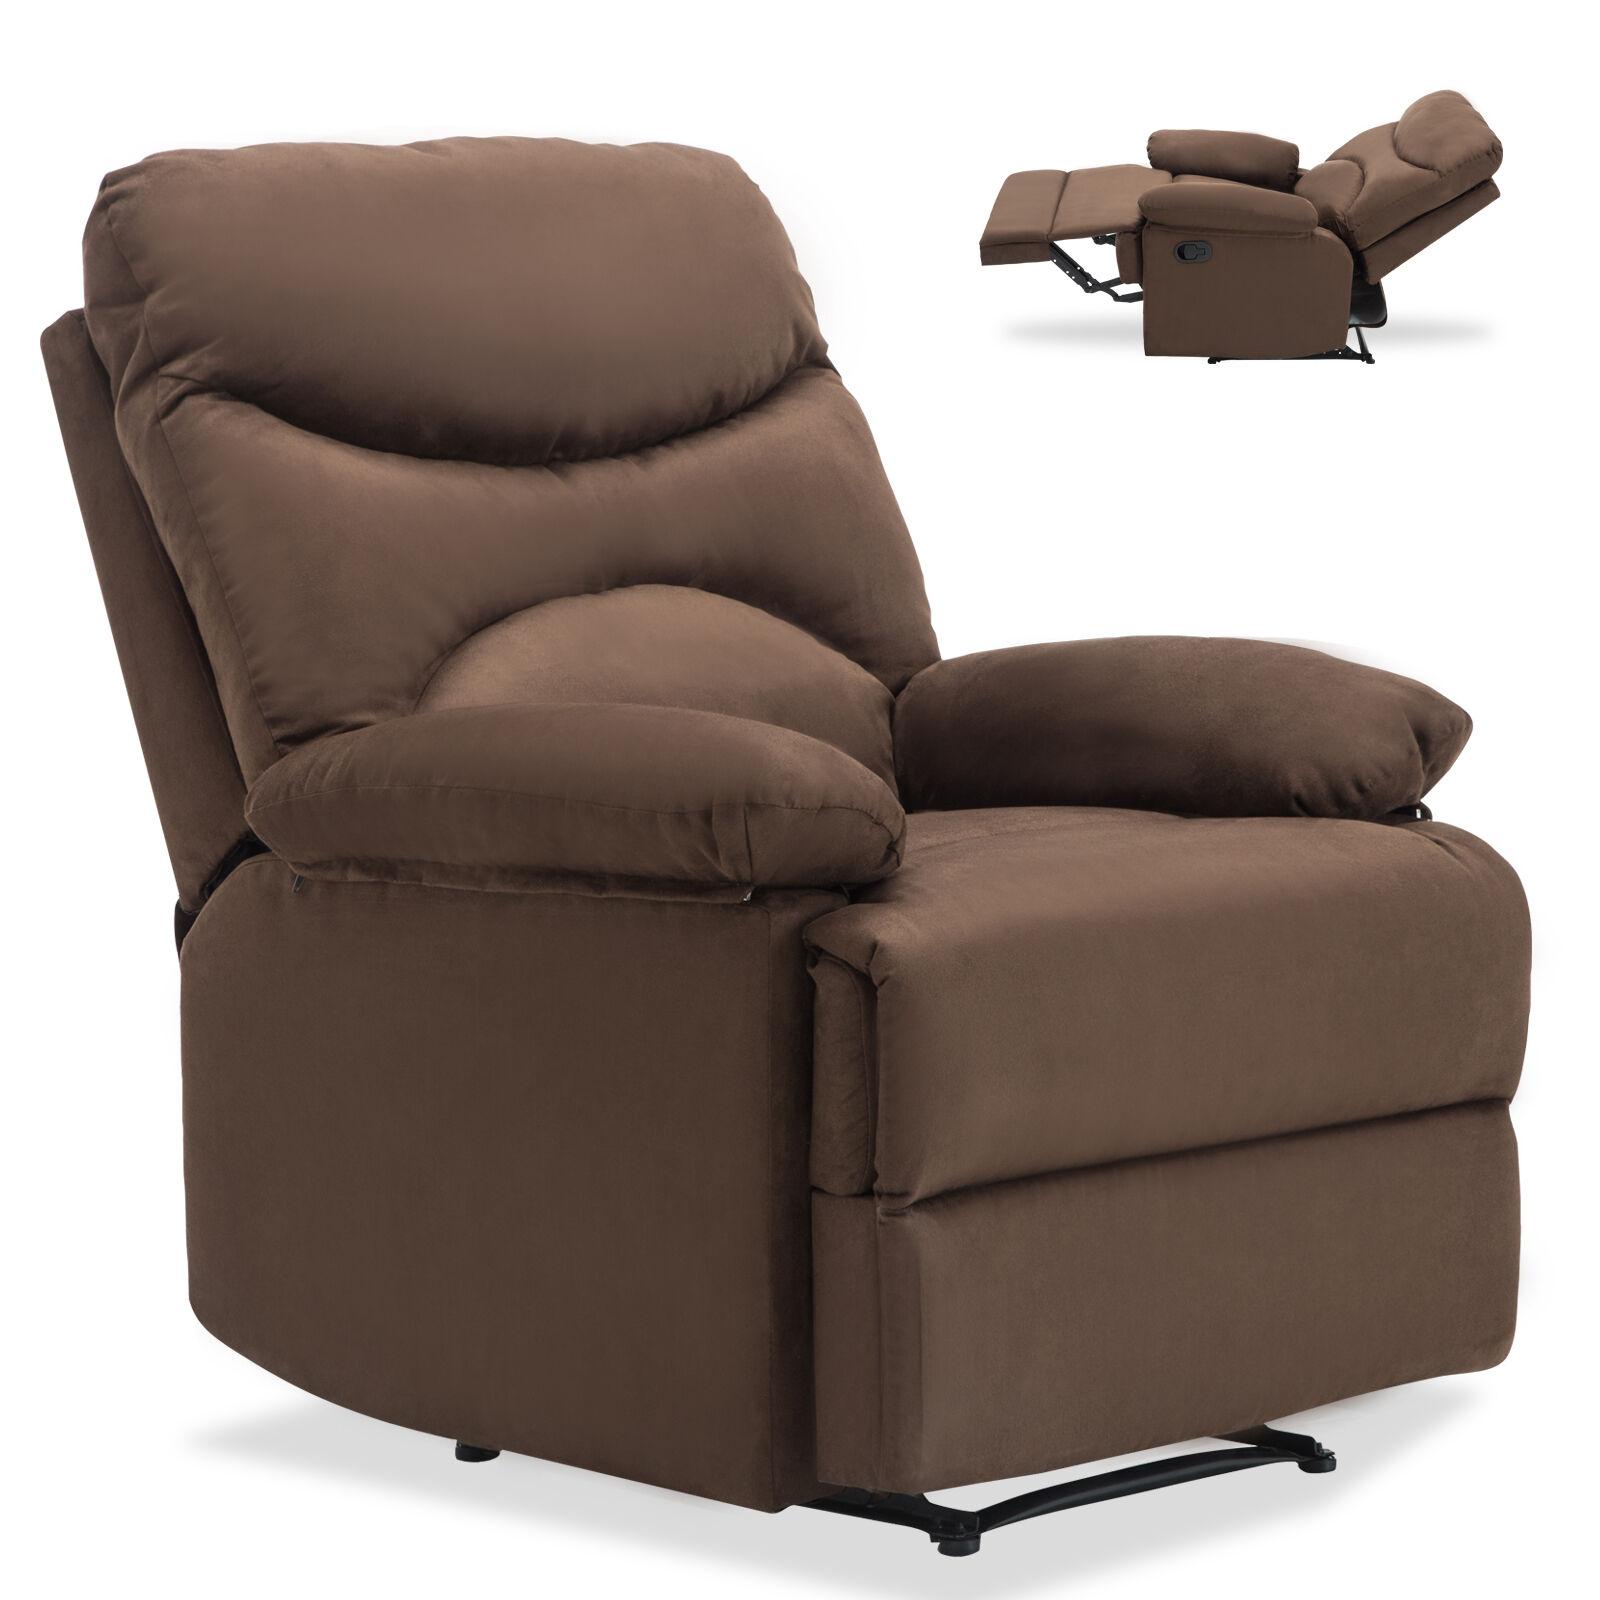 microfiber massage recliner sofa chair ergonomic lounge swivel heated wcontrol sofa chair s9 sofa